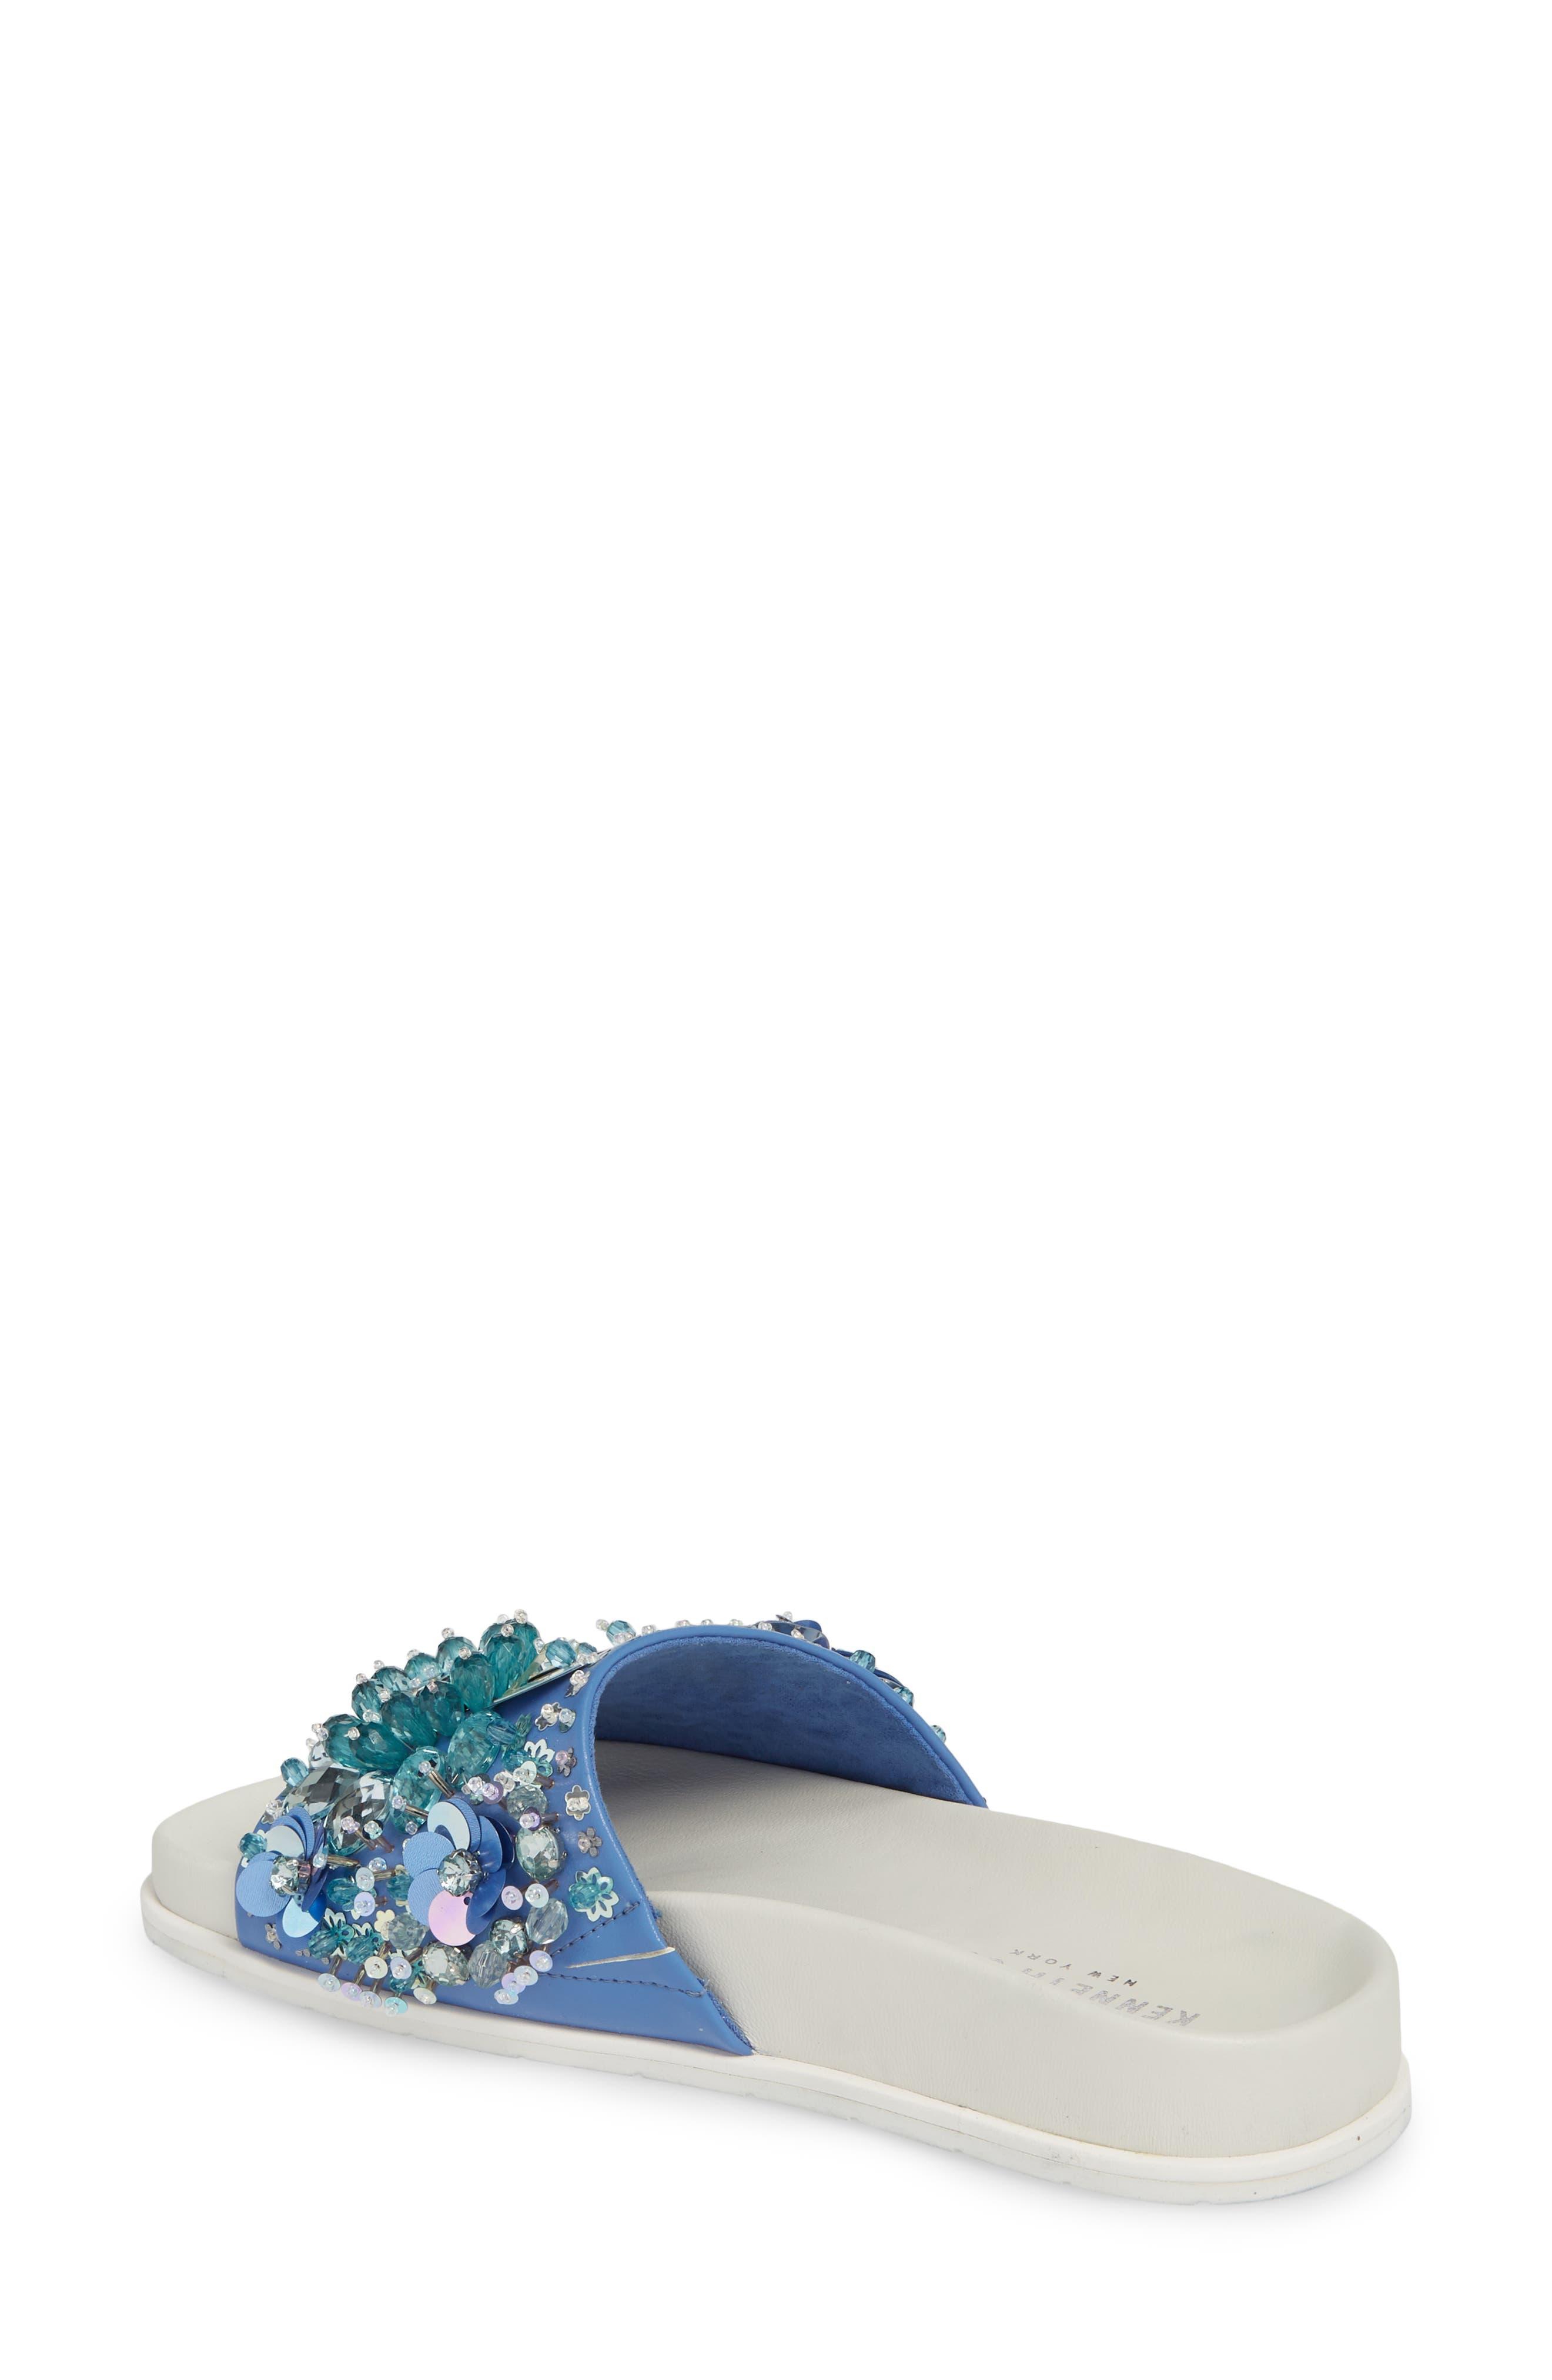 Xenia Sequin Embellished Sandal,                             Alternate thumbnail 2, color,                             Blue Multi Fabric